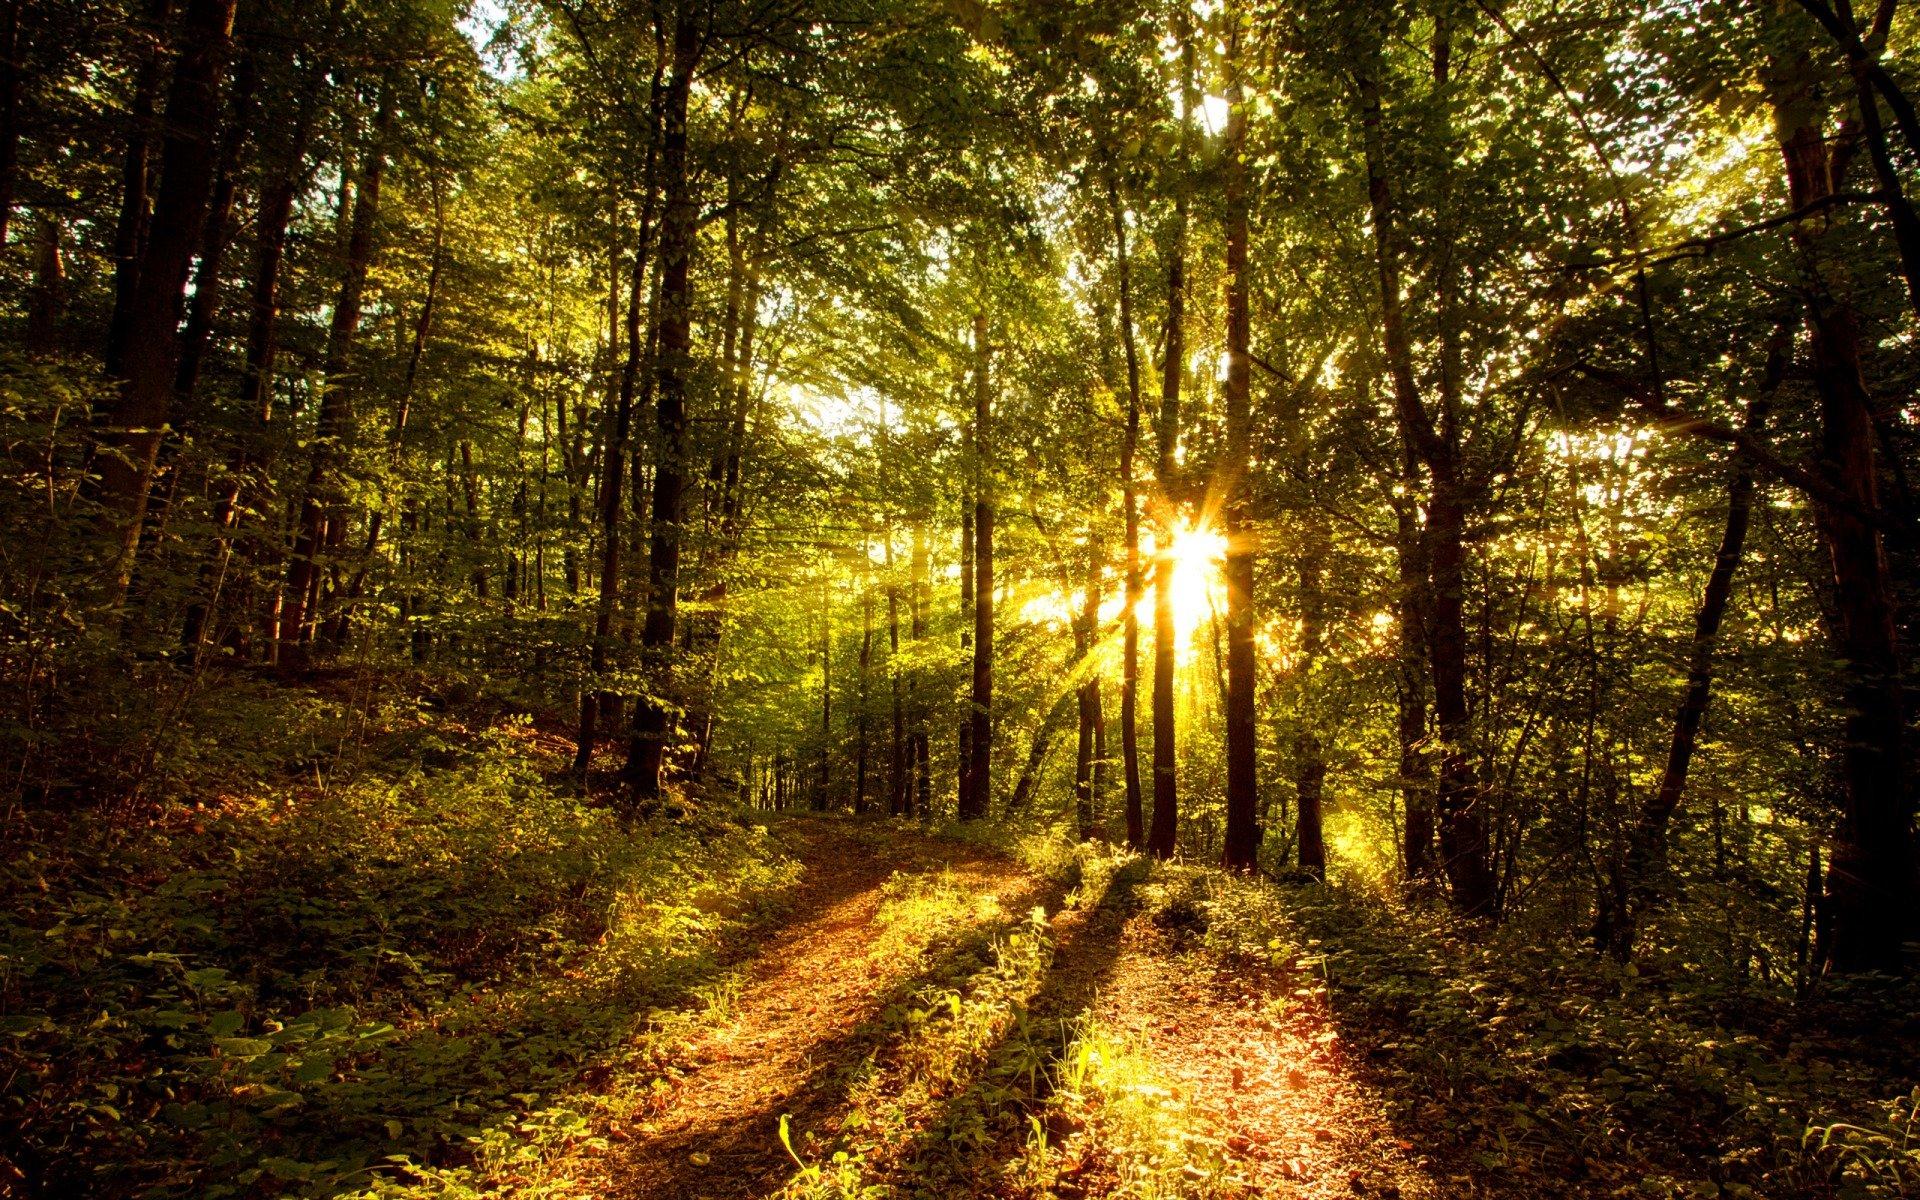 xcitefun forest sun image